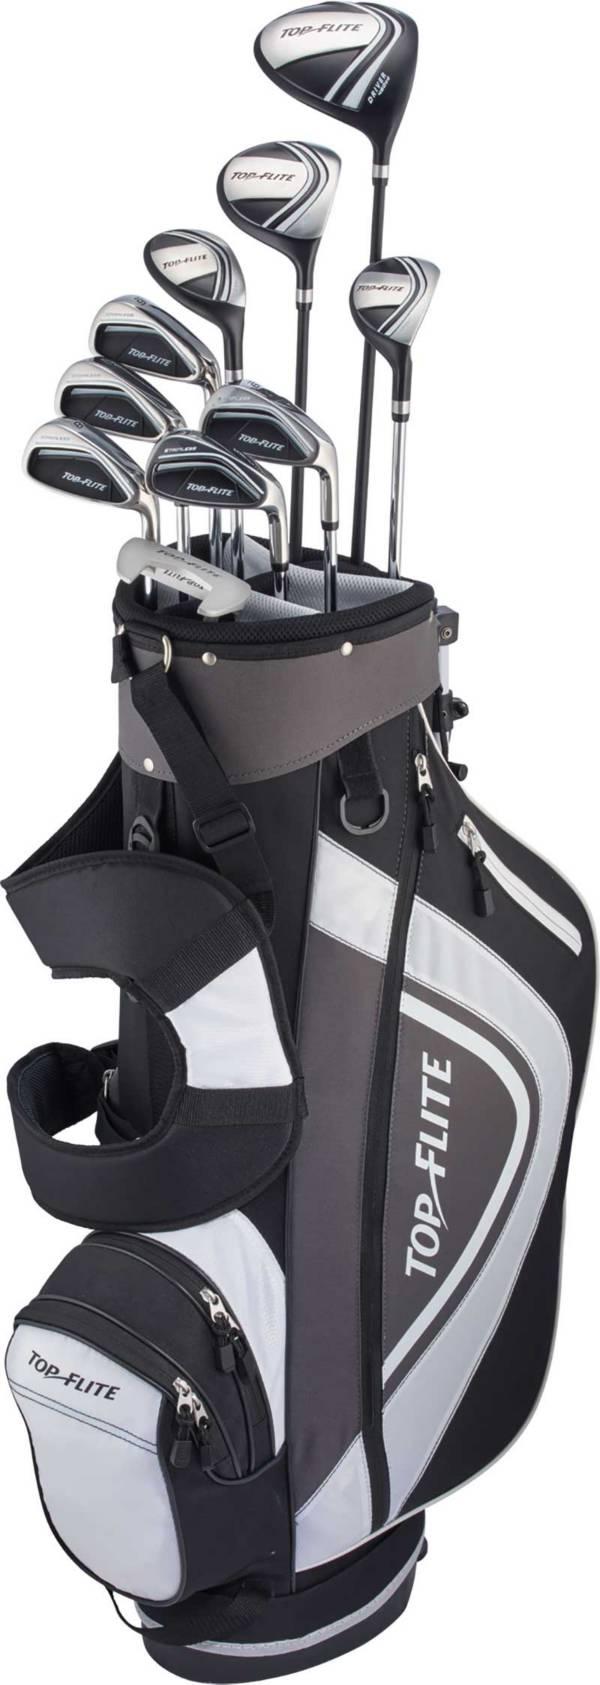 Top Flite 2018 XL 13-Piece Complete Set – (Graphite) – Black/Grey product image